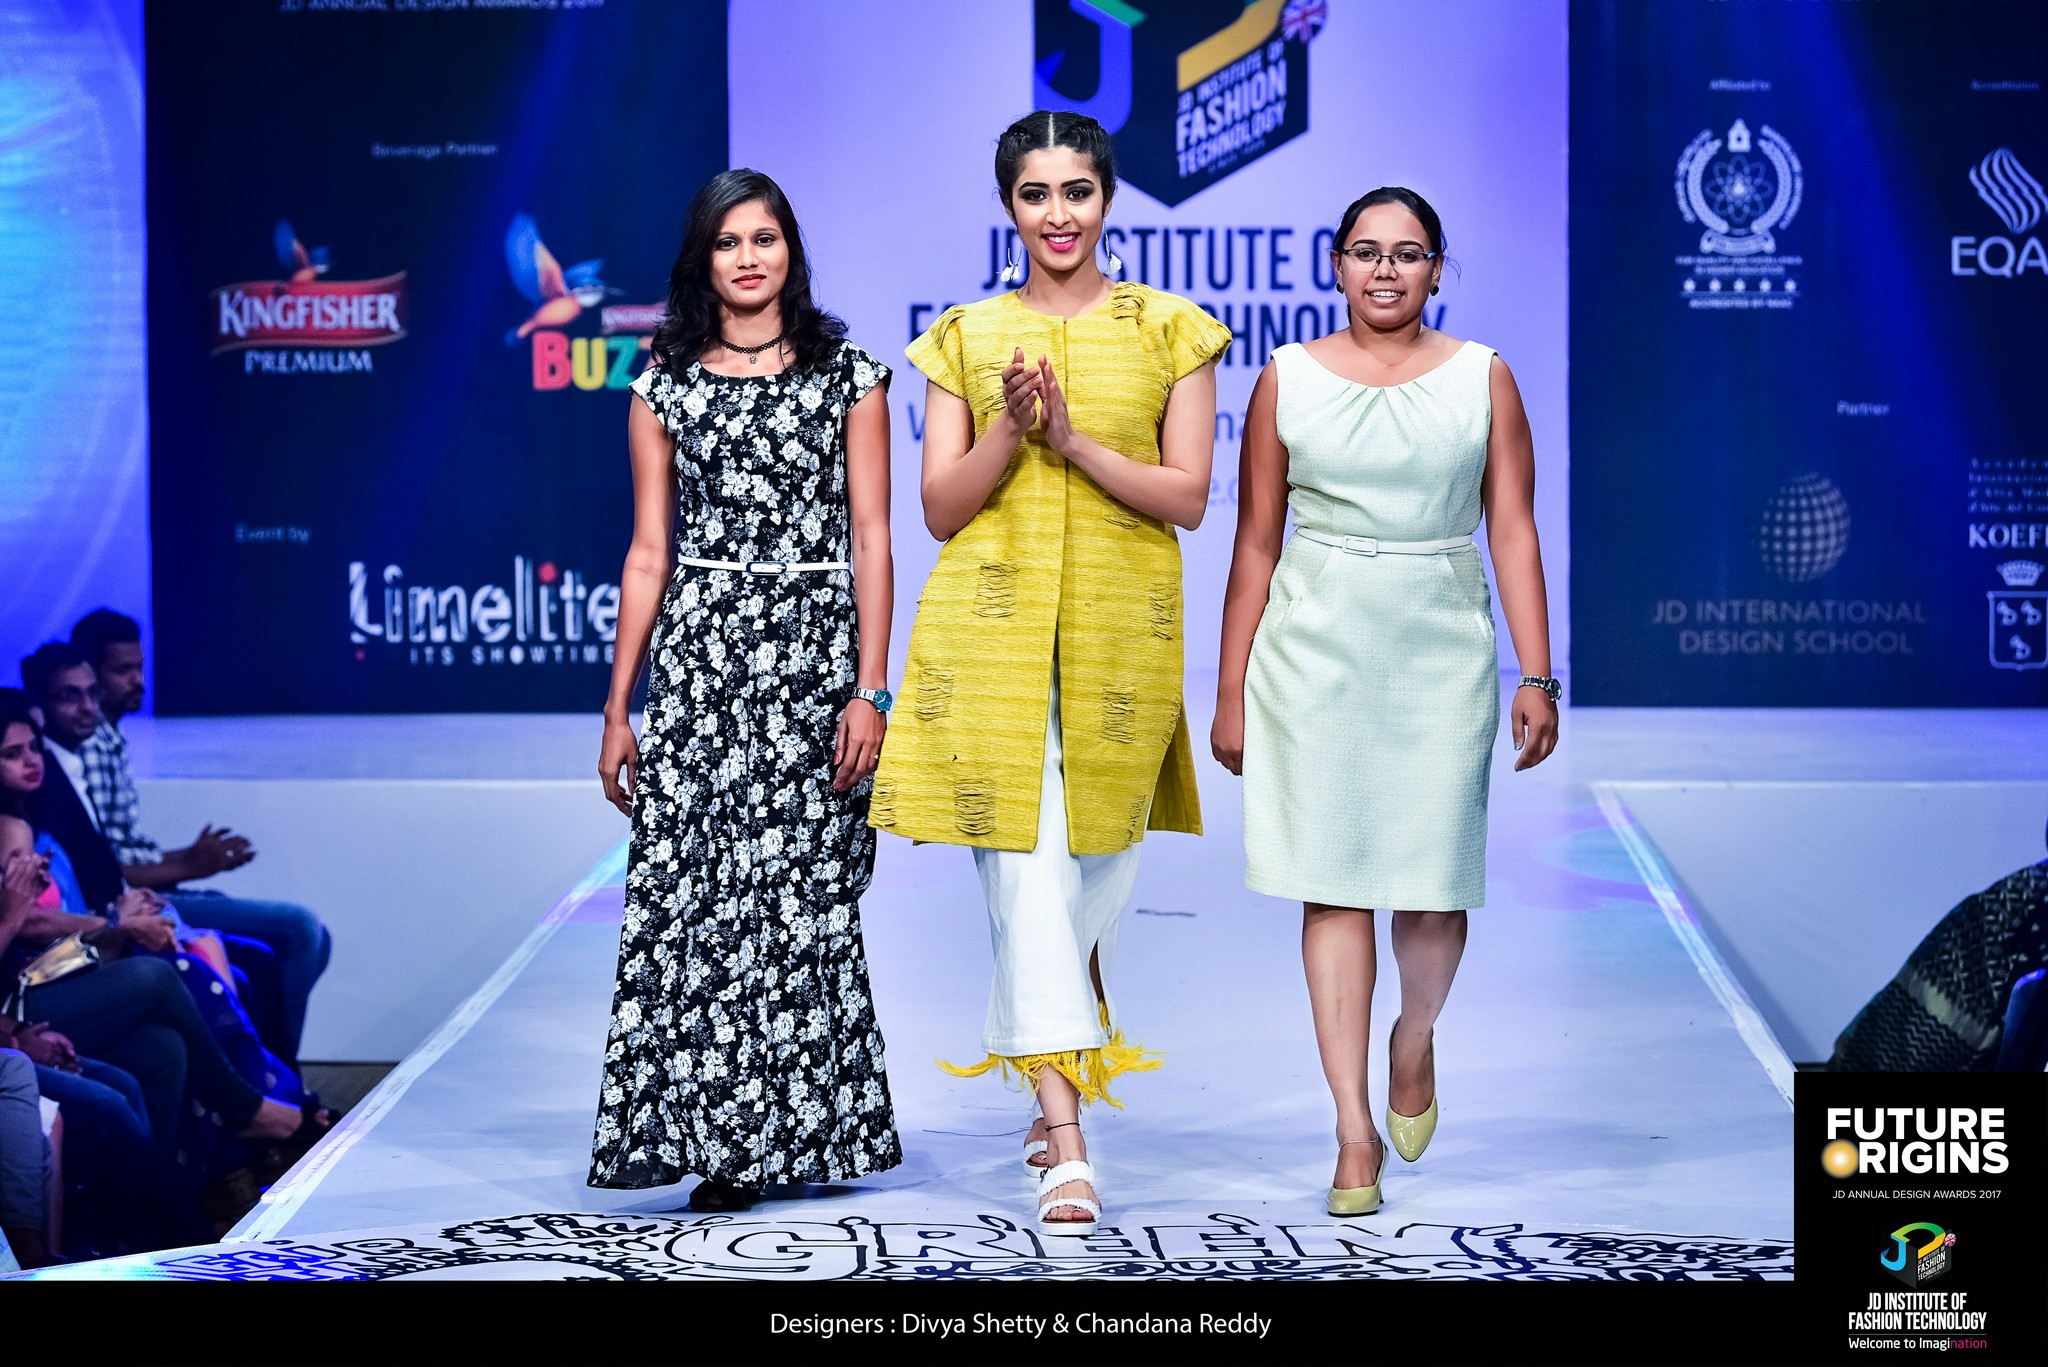 Kapastela - Future Origin - JD Annual Design Awards 2017 | Photography : Jerin Nath (@jerin_nath) kapastela - Kapastela     Future Origin     JD Annual Design Awards 2017 5 - Kapastela – Future Origin – JD Annual Design Awards 2017